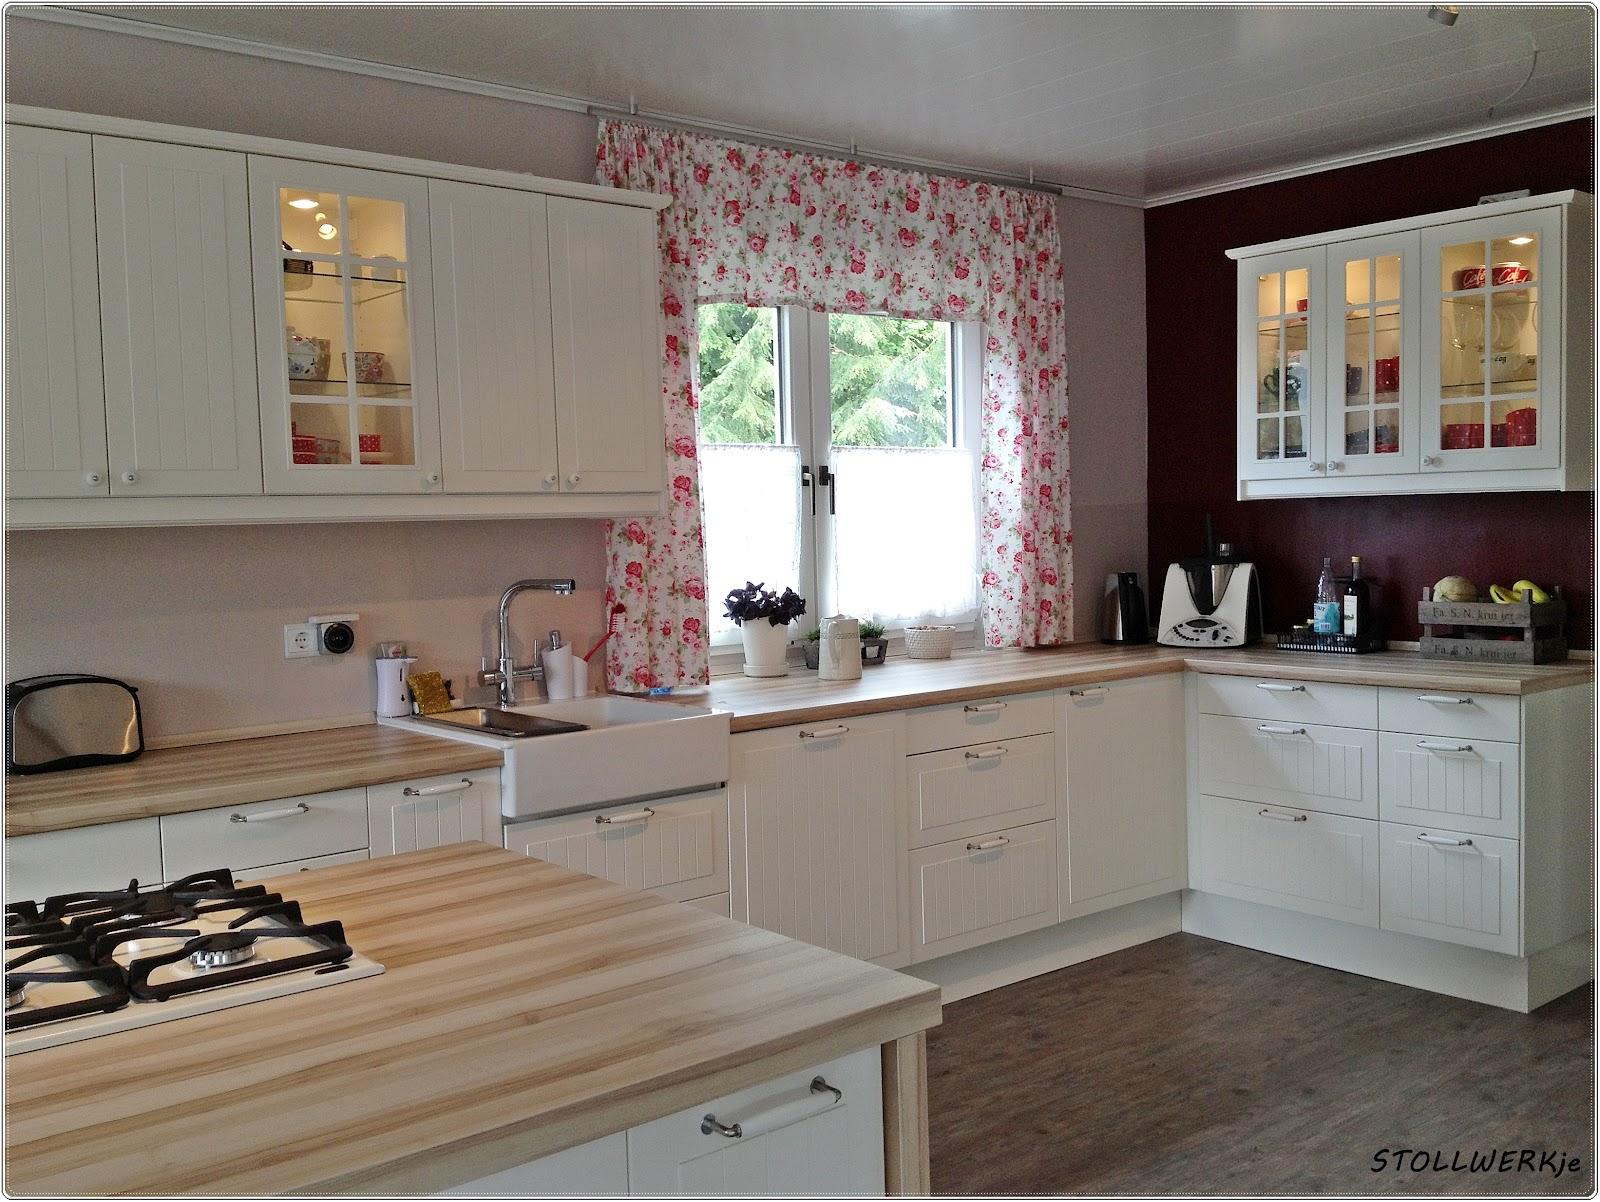 ikea kche online planen khles kuche bestellen ikea kuche lieferzeit with ikea kche online. Black Bedroom Furniture Sets. Home Design Ideas